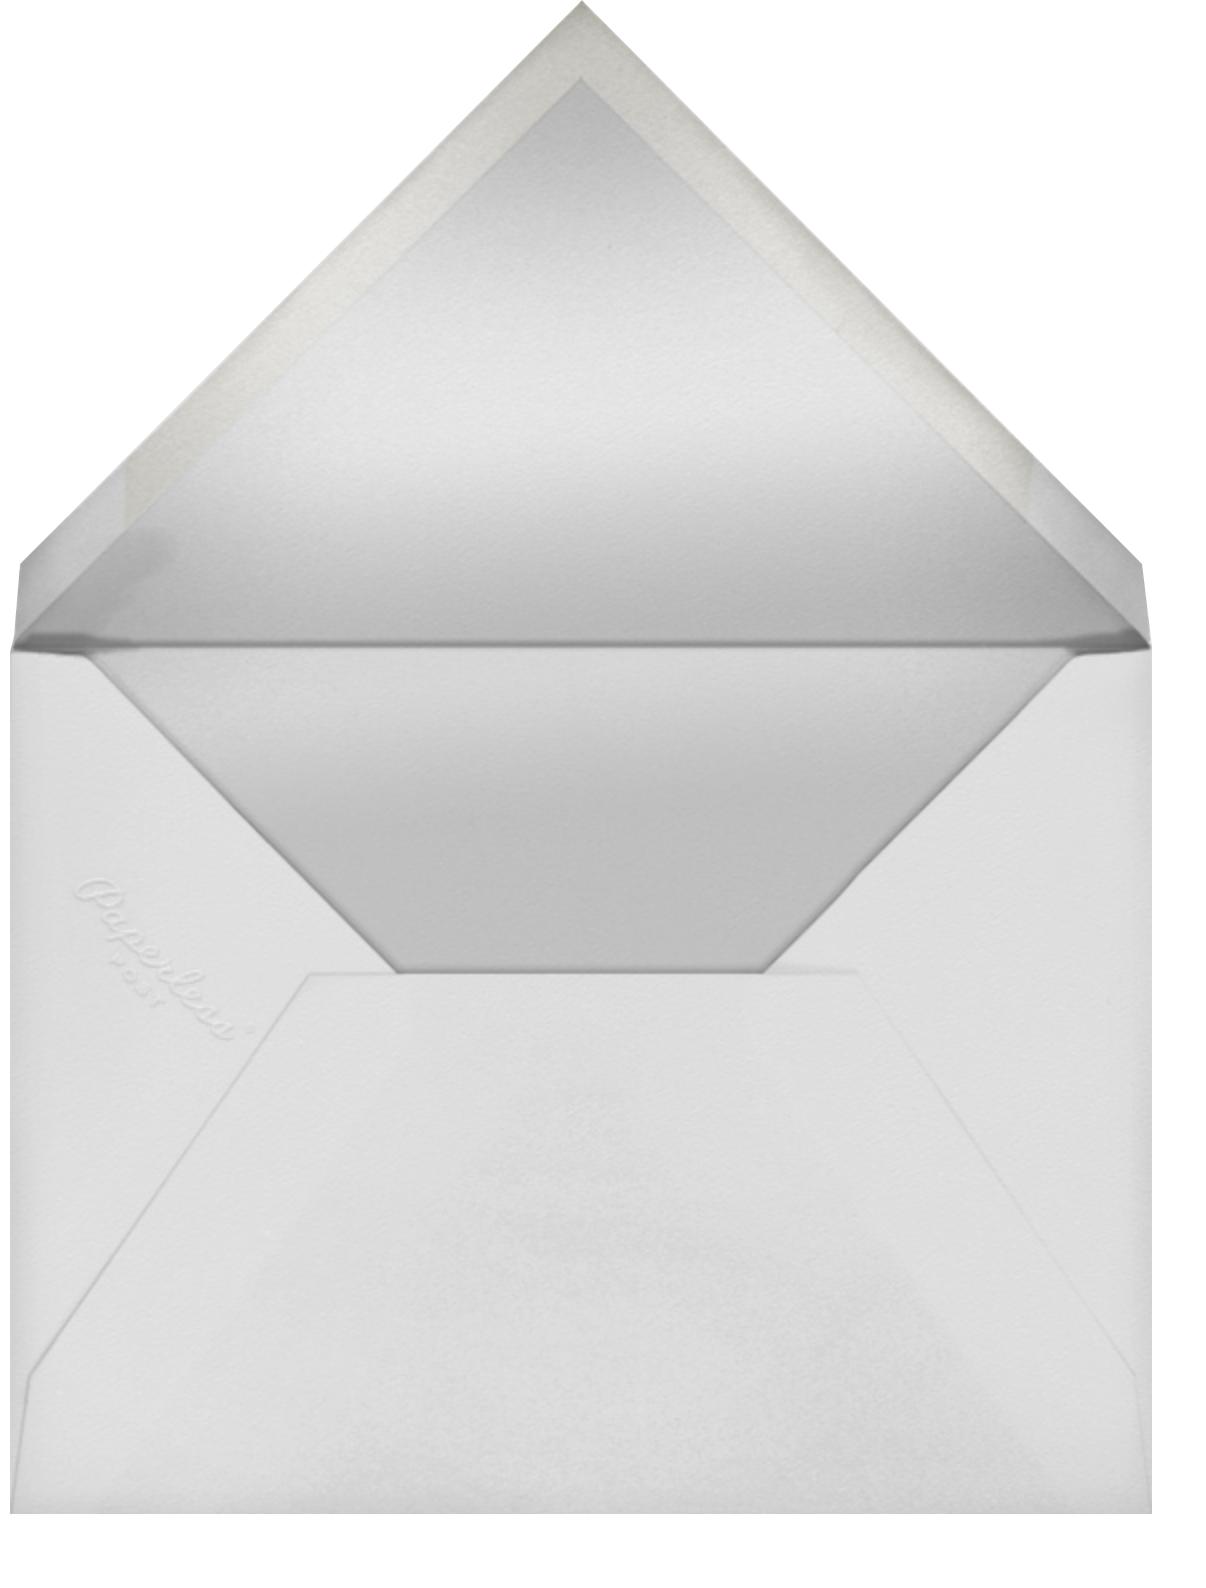 Confetti (Menu) - Aqua/Gold - kate spade new york - Menus - envelope back